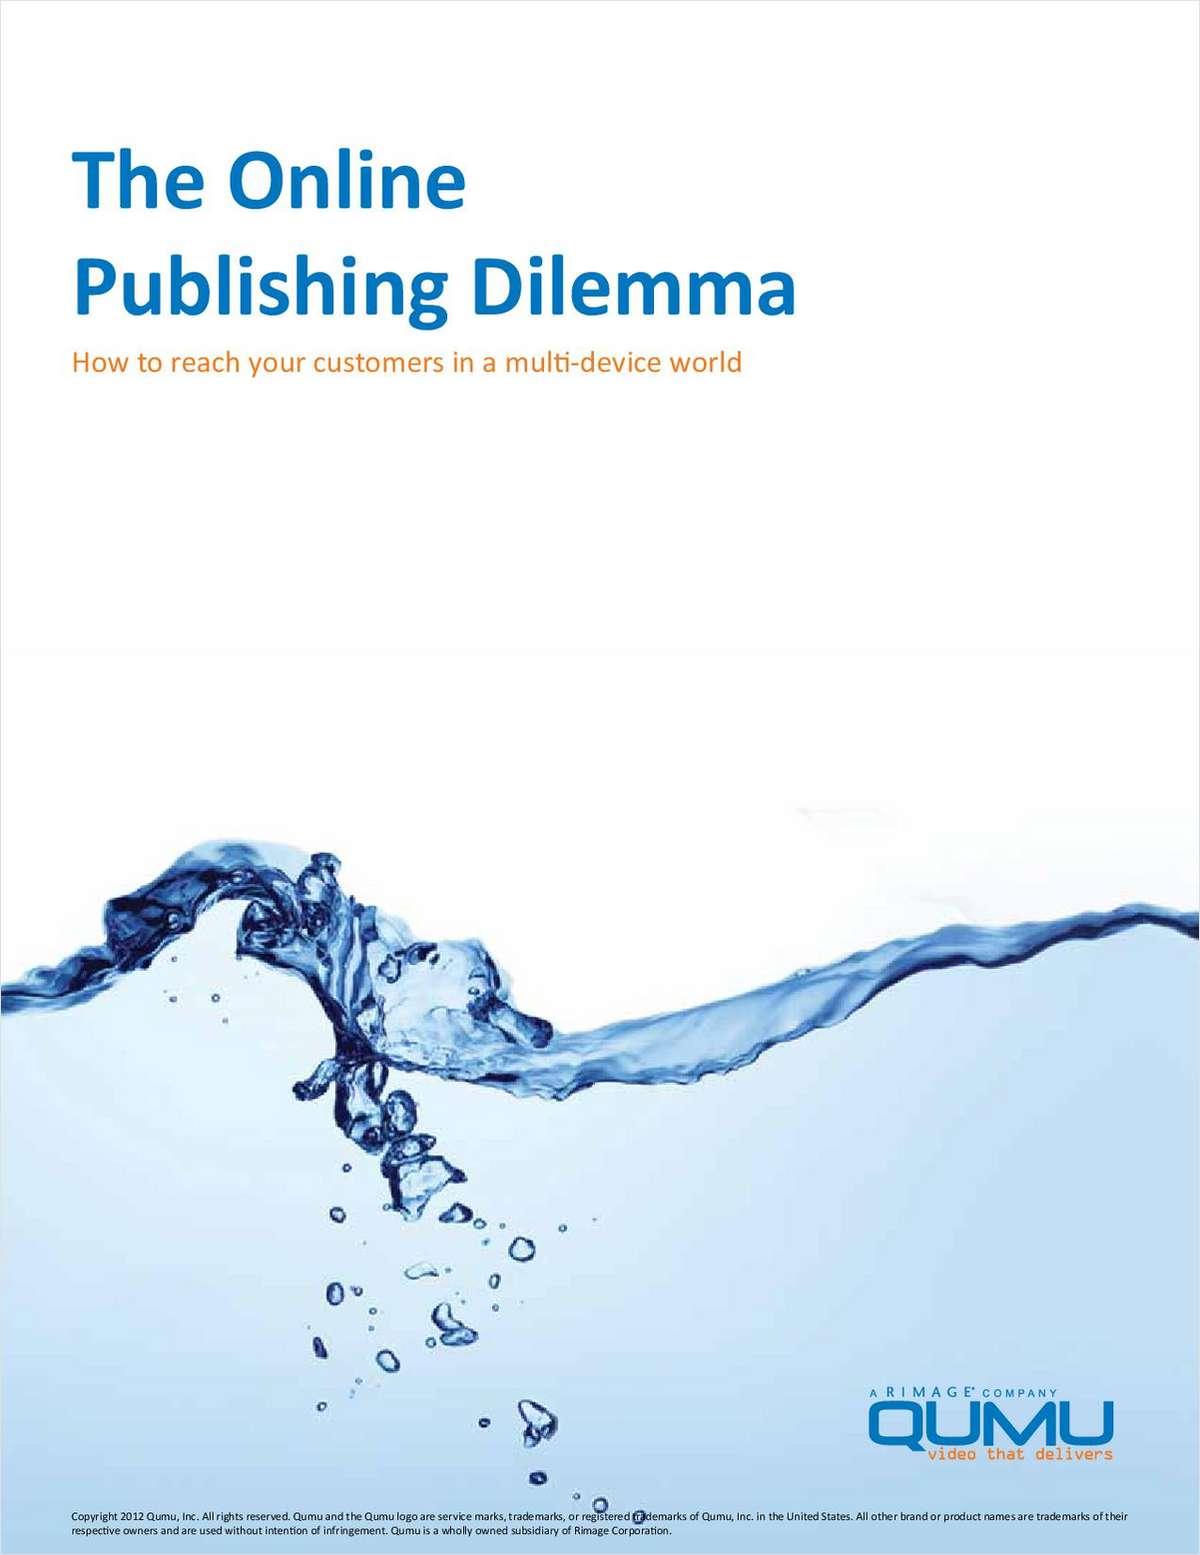 The Online Publishing Dilemma